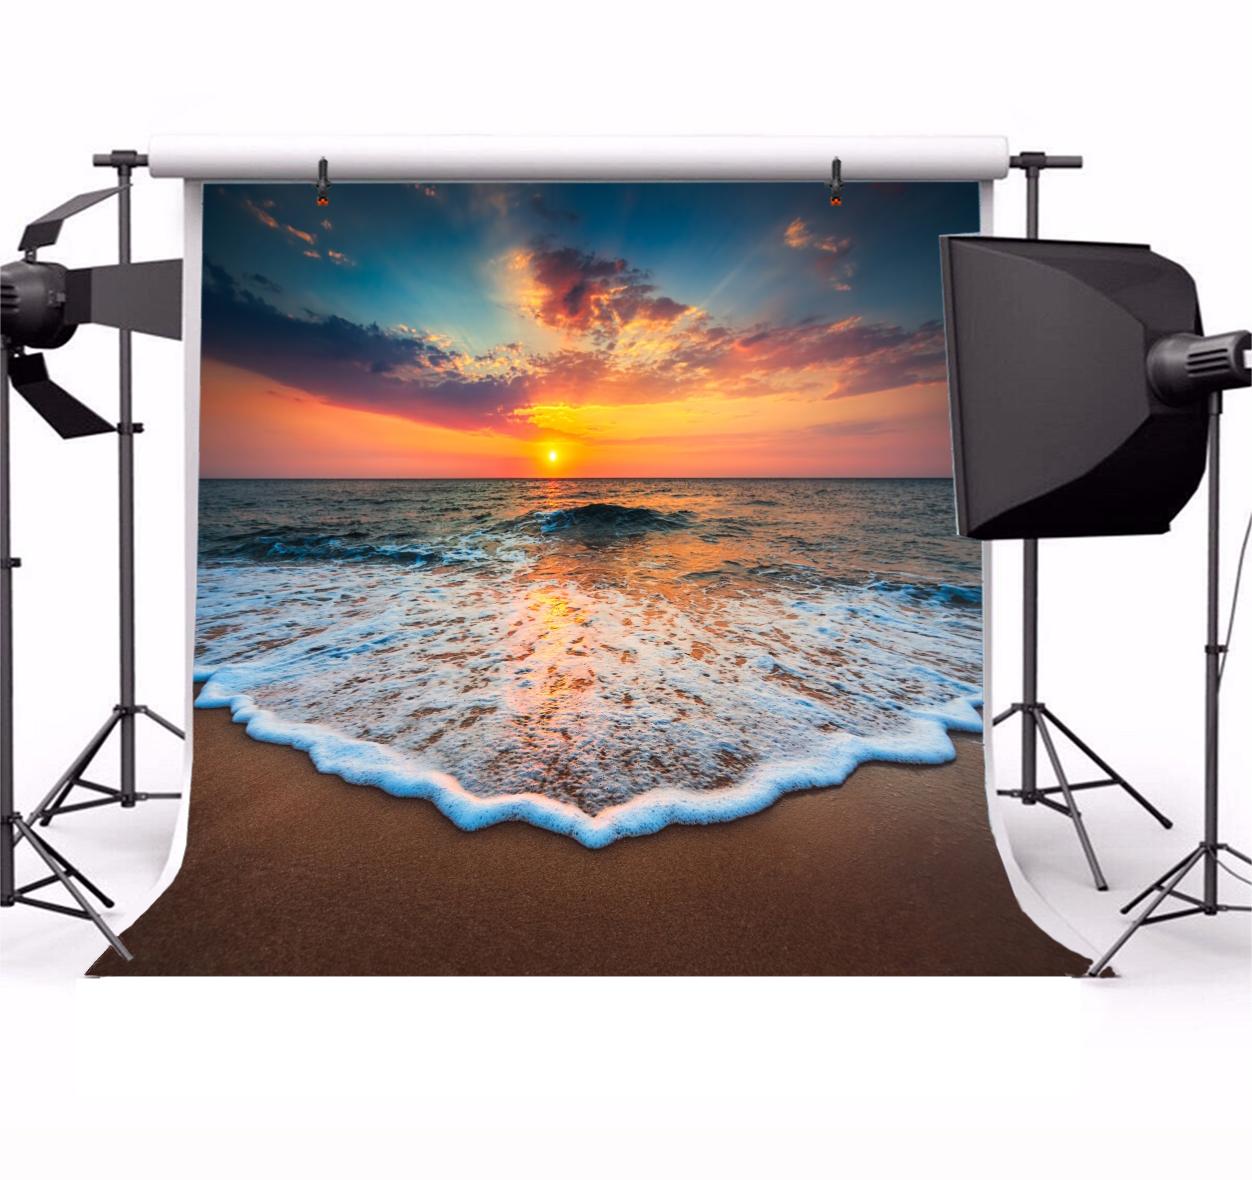 8x8FT Vinyl Wall Photography Backdrop,Beach,Sunrise Horizon Calm Waves Photo Backdrop Baby Newborn Photo Studio Props